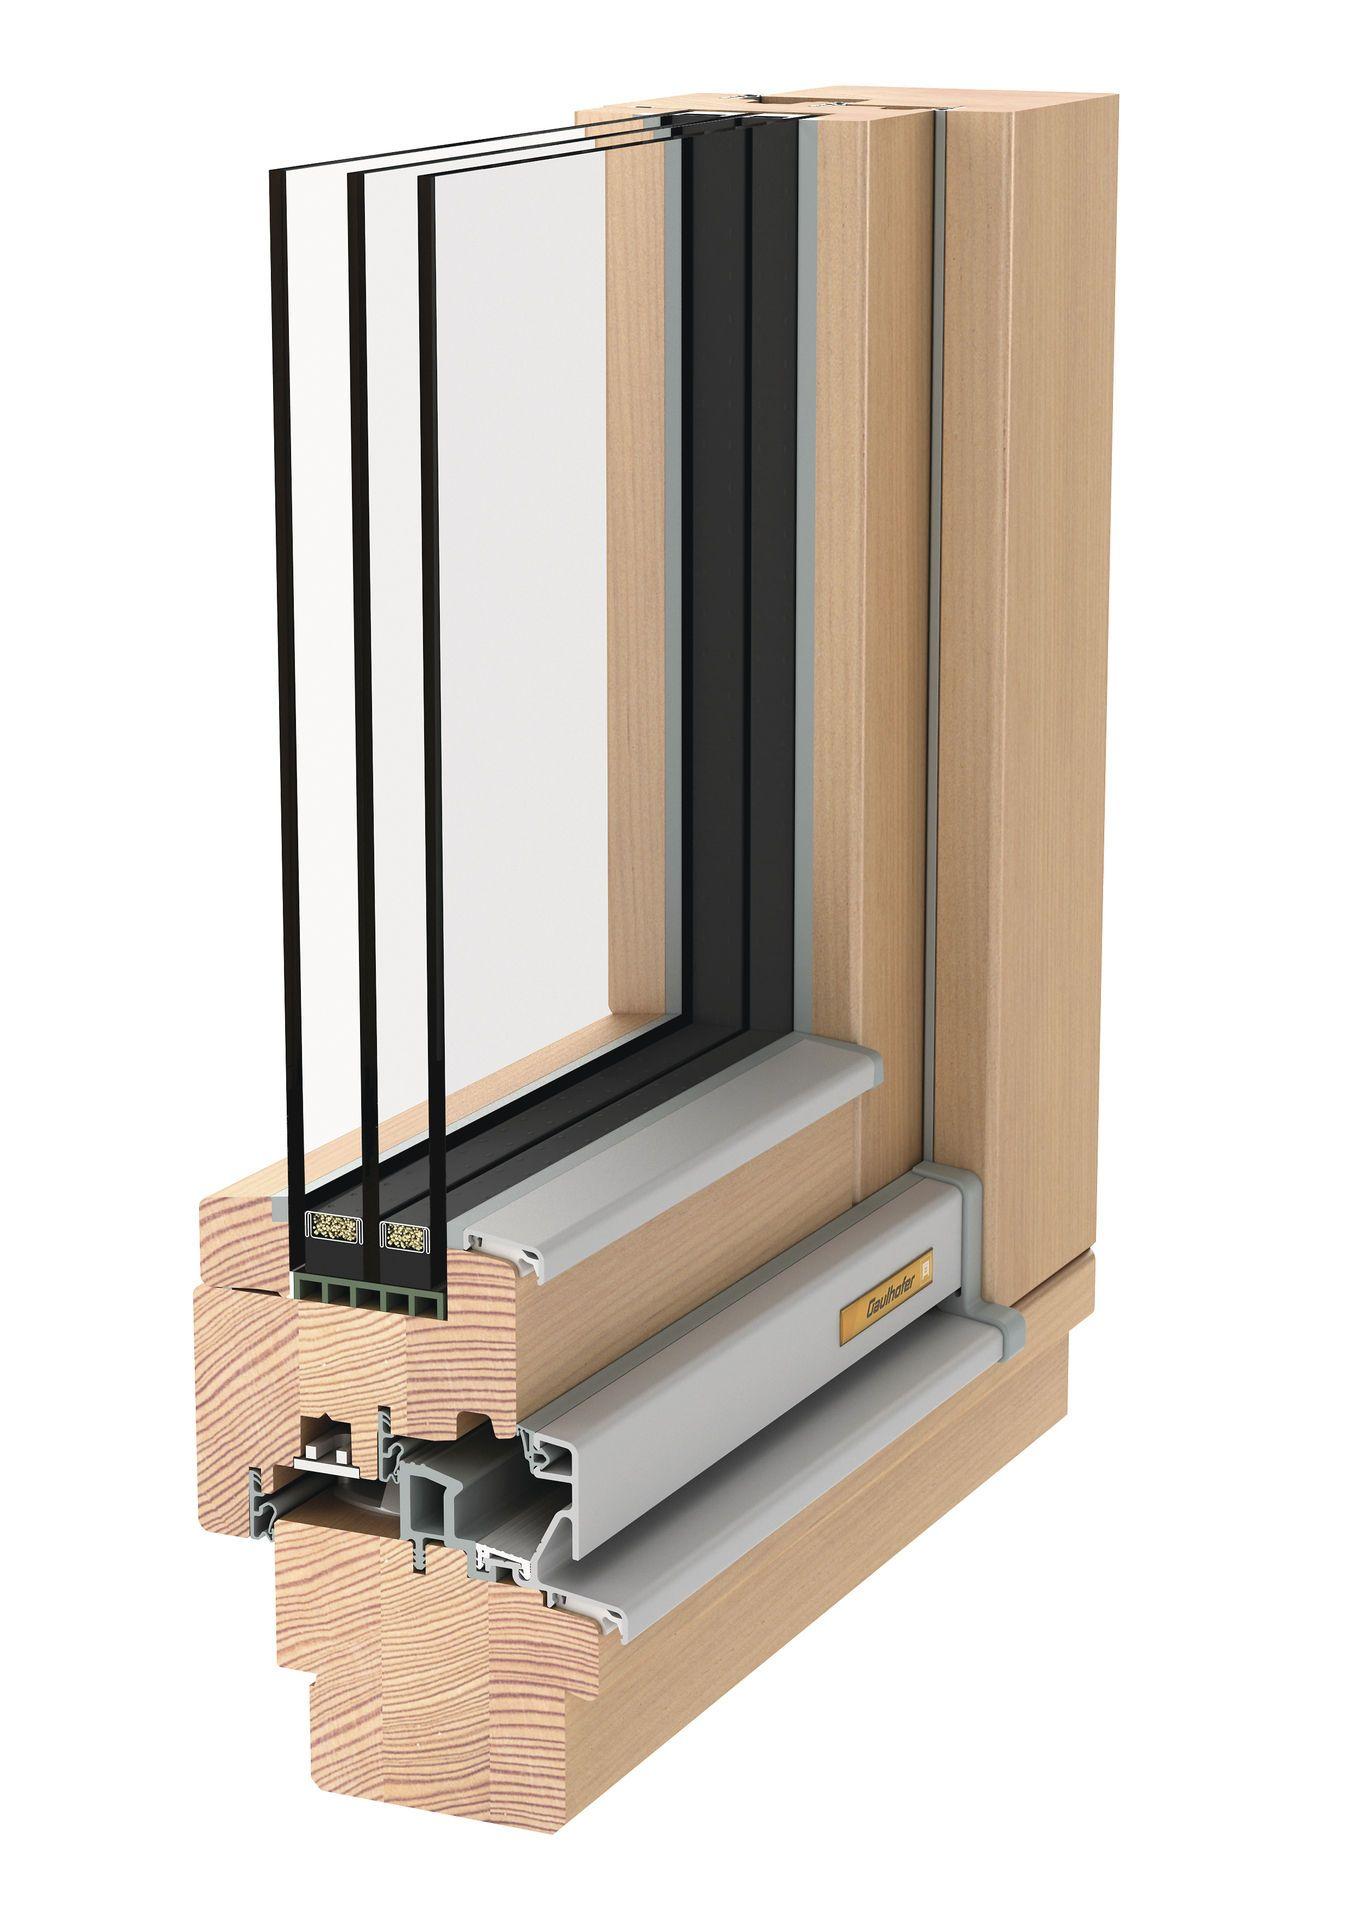 Full Size of Holz Alu Fenster Preise Aluminium Kosten Josko Preisliste Unilux Online Erfahrungen Pro M2 Preisunterschied Preis Leistung Qm Holz Alu Preisvergleich Aus Und Fenster Holz Alu Fenster Preise